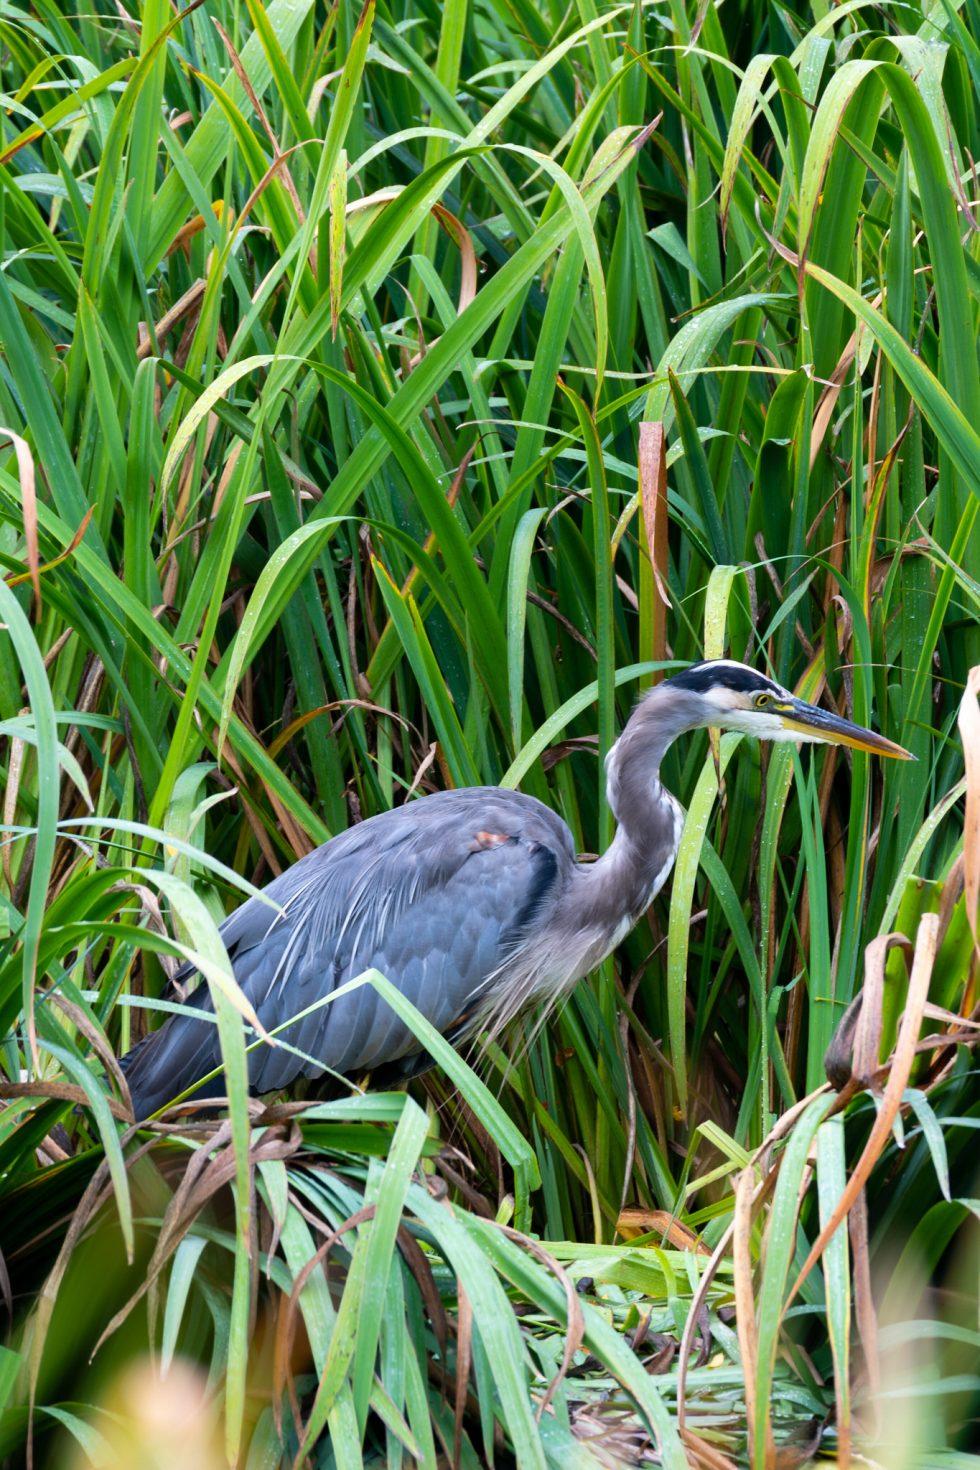 Great Blue Heron, Dawson Creek Ponds, Hillsboro, Oregon